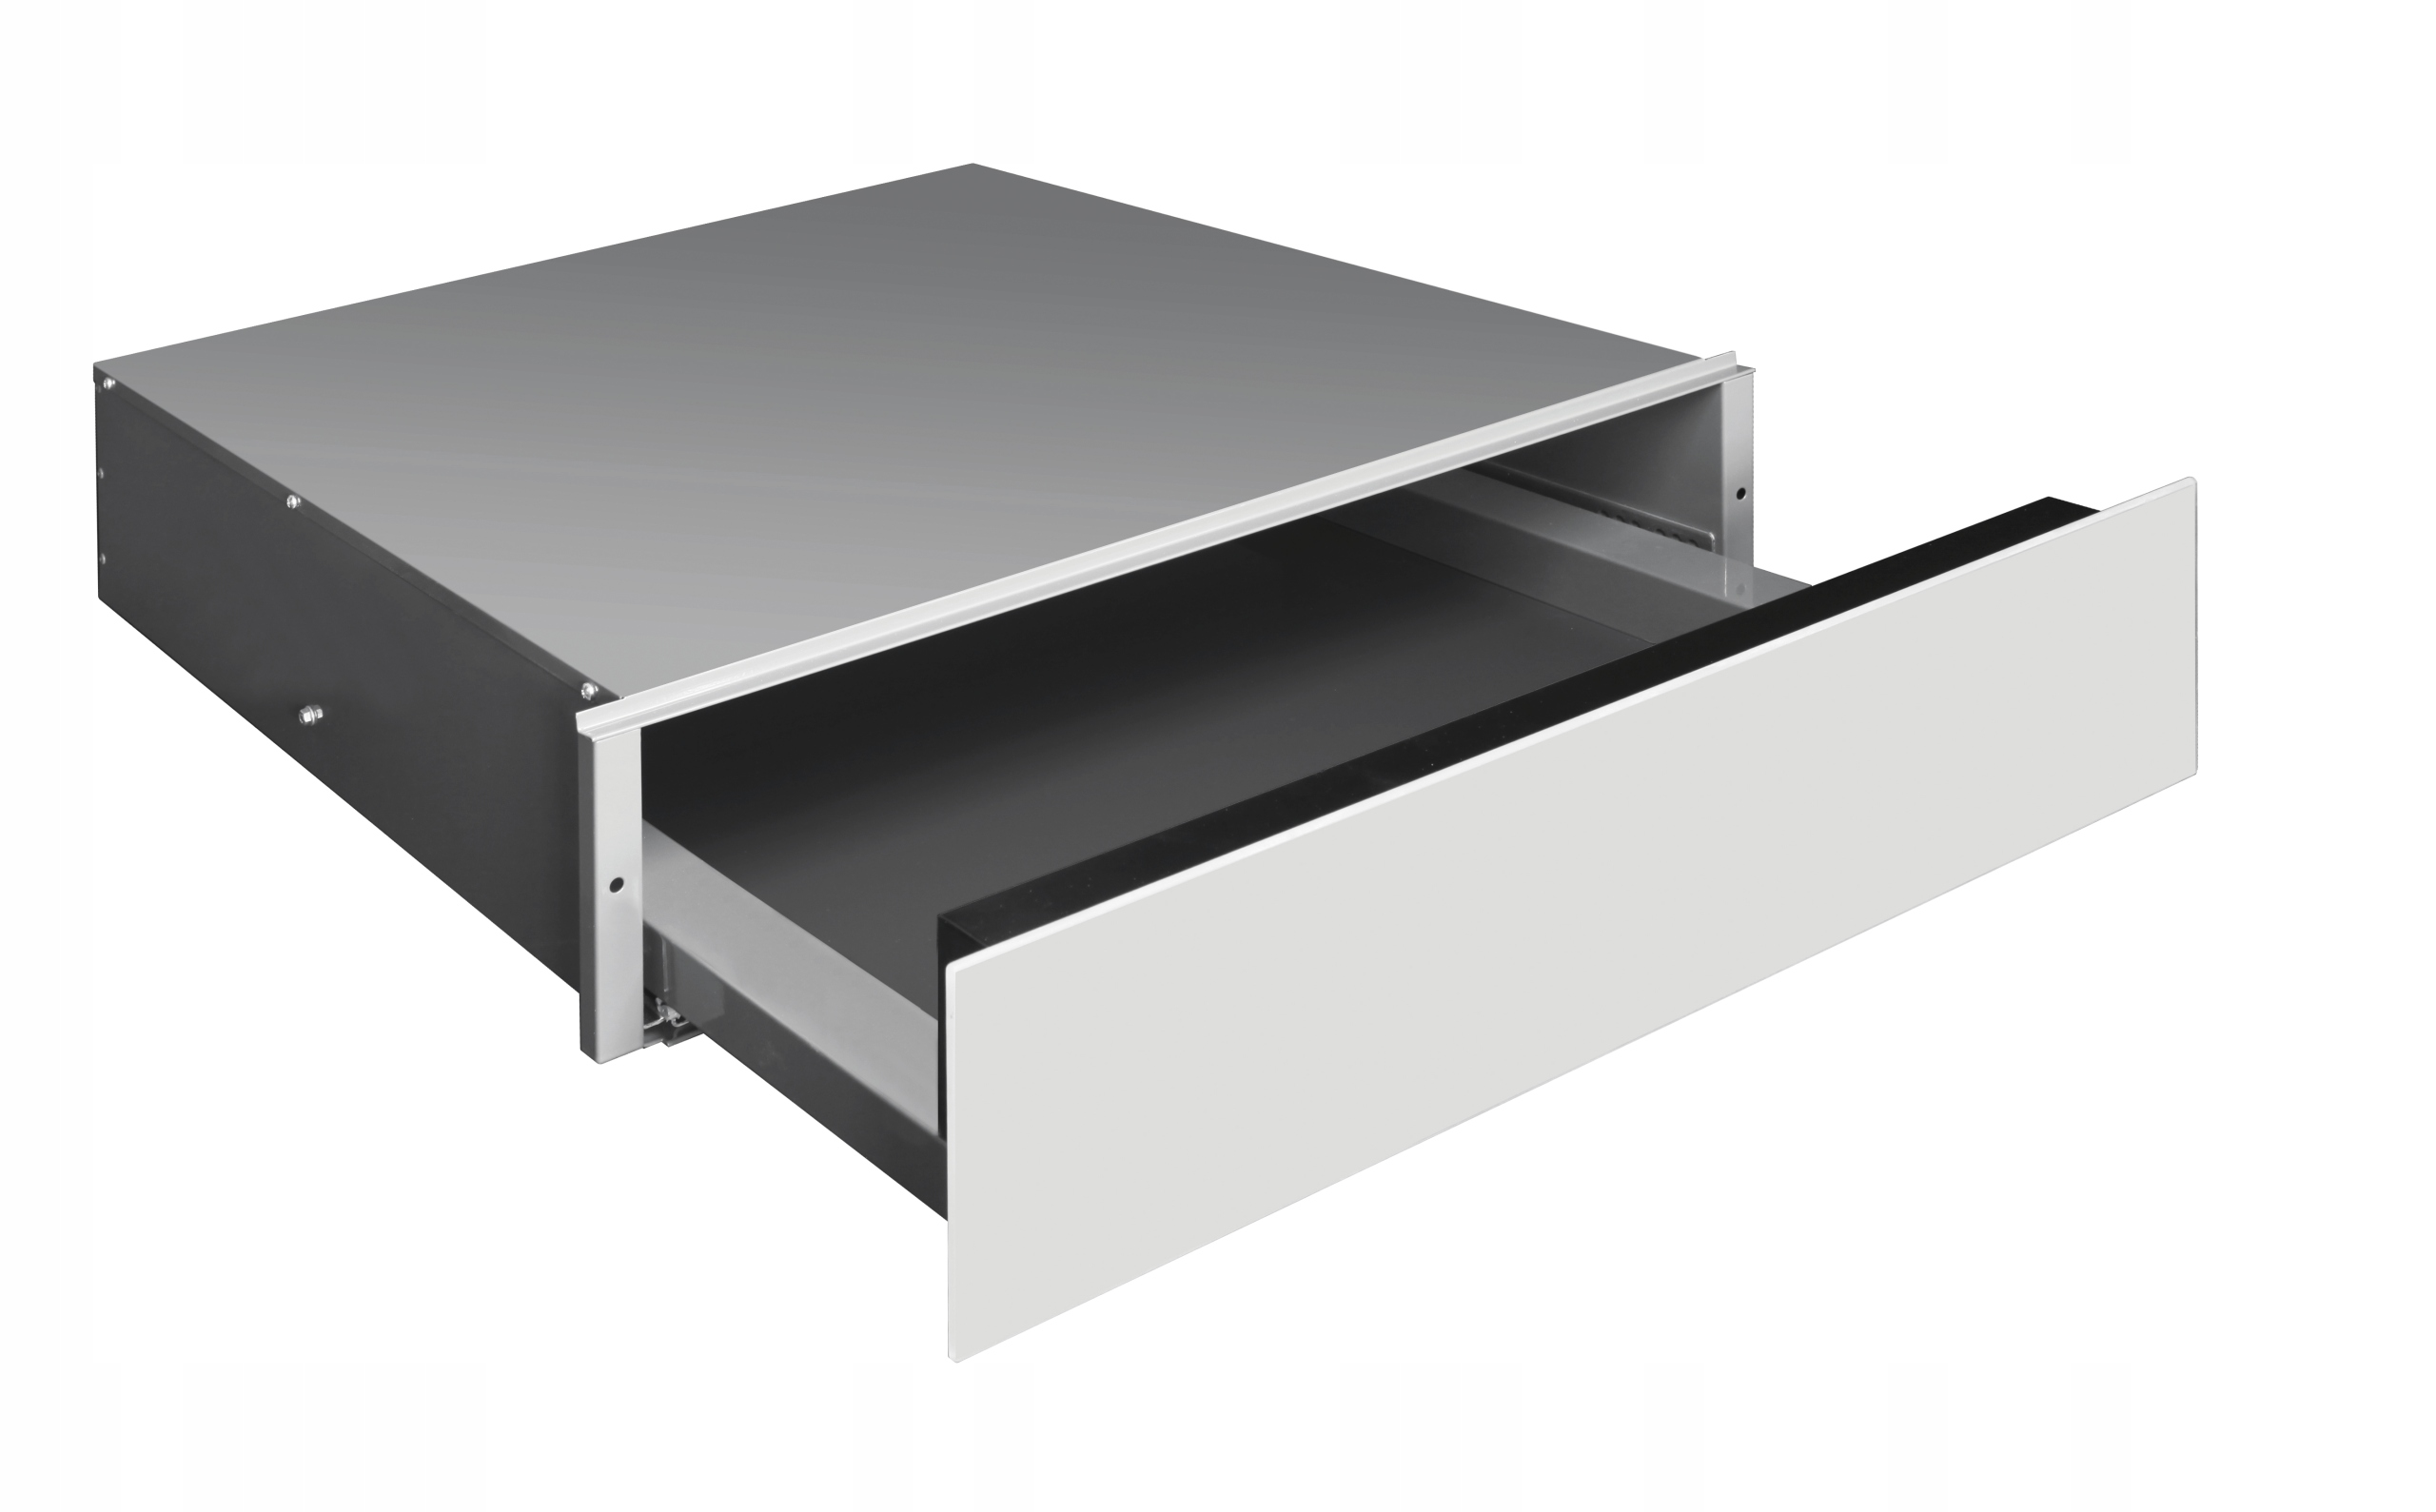 Gorenje SD 14ST ящик для хранения 60см